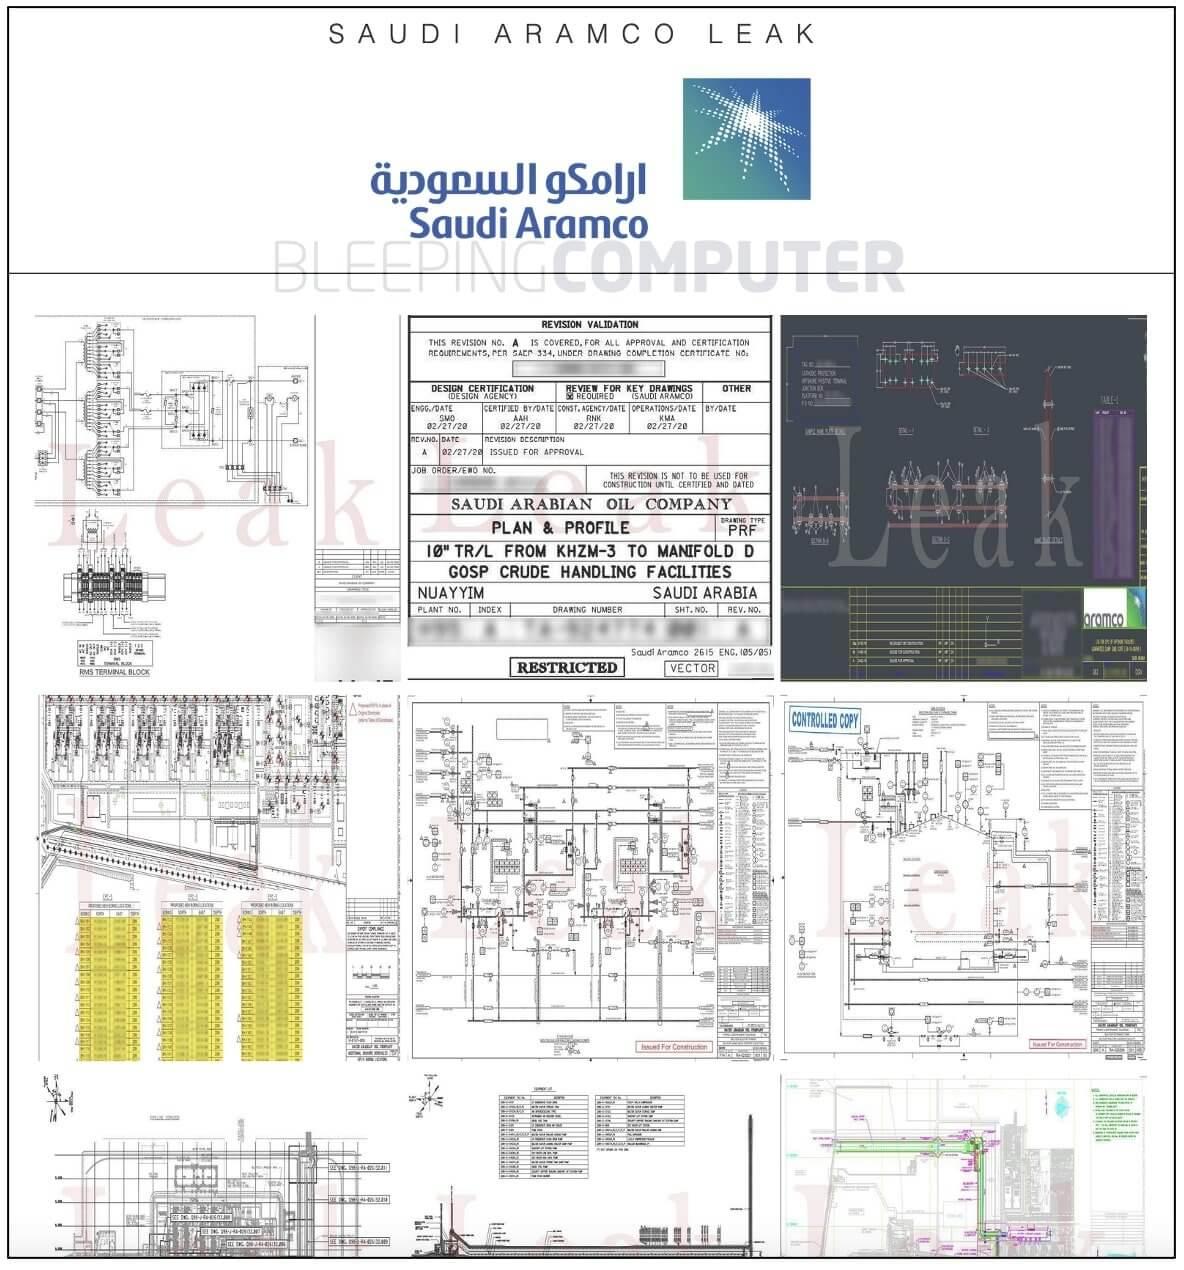 Samples of stolen Saudi Aramco data and blueprints shared on leak site